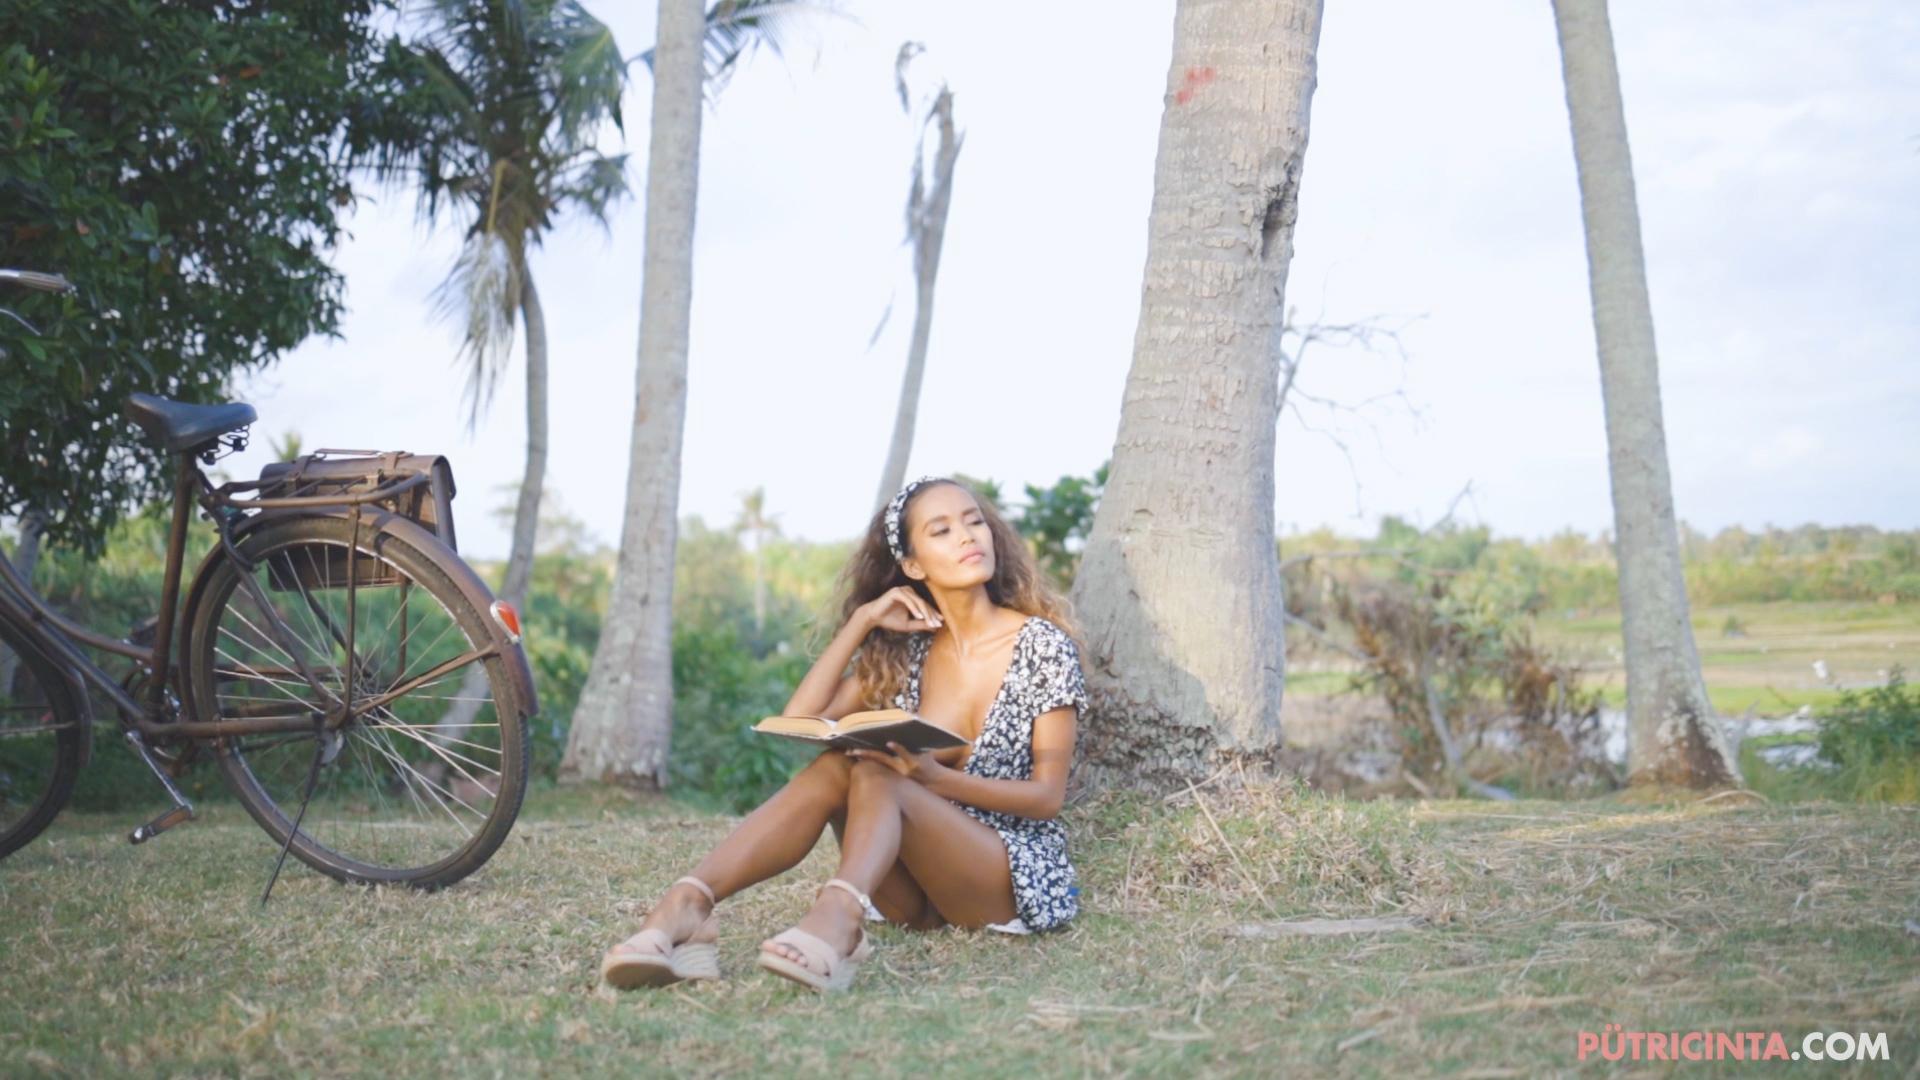 024-cyclingcommando-Putri-Cinta-teaser-stills-15.jpg